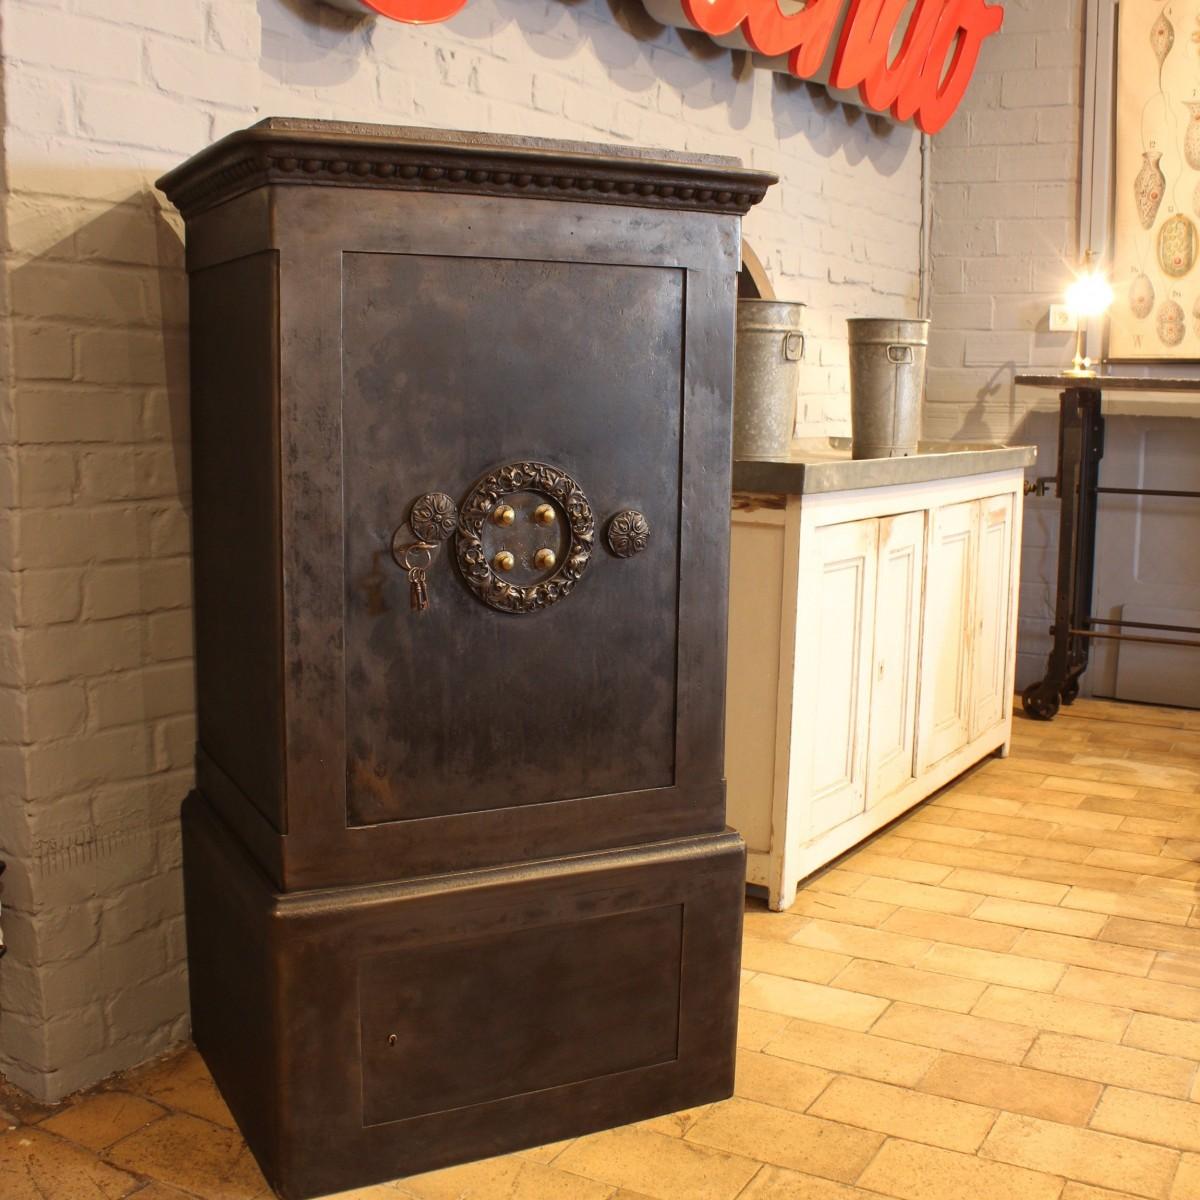 mobilier industriel ancien coffre fort industriel 1900. Black Bedroom Furniture Sets. Home Design Ideas